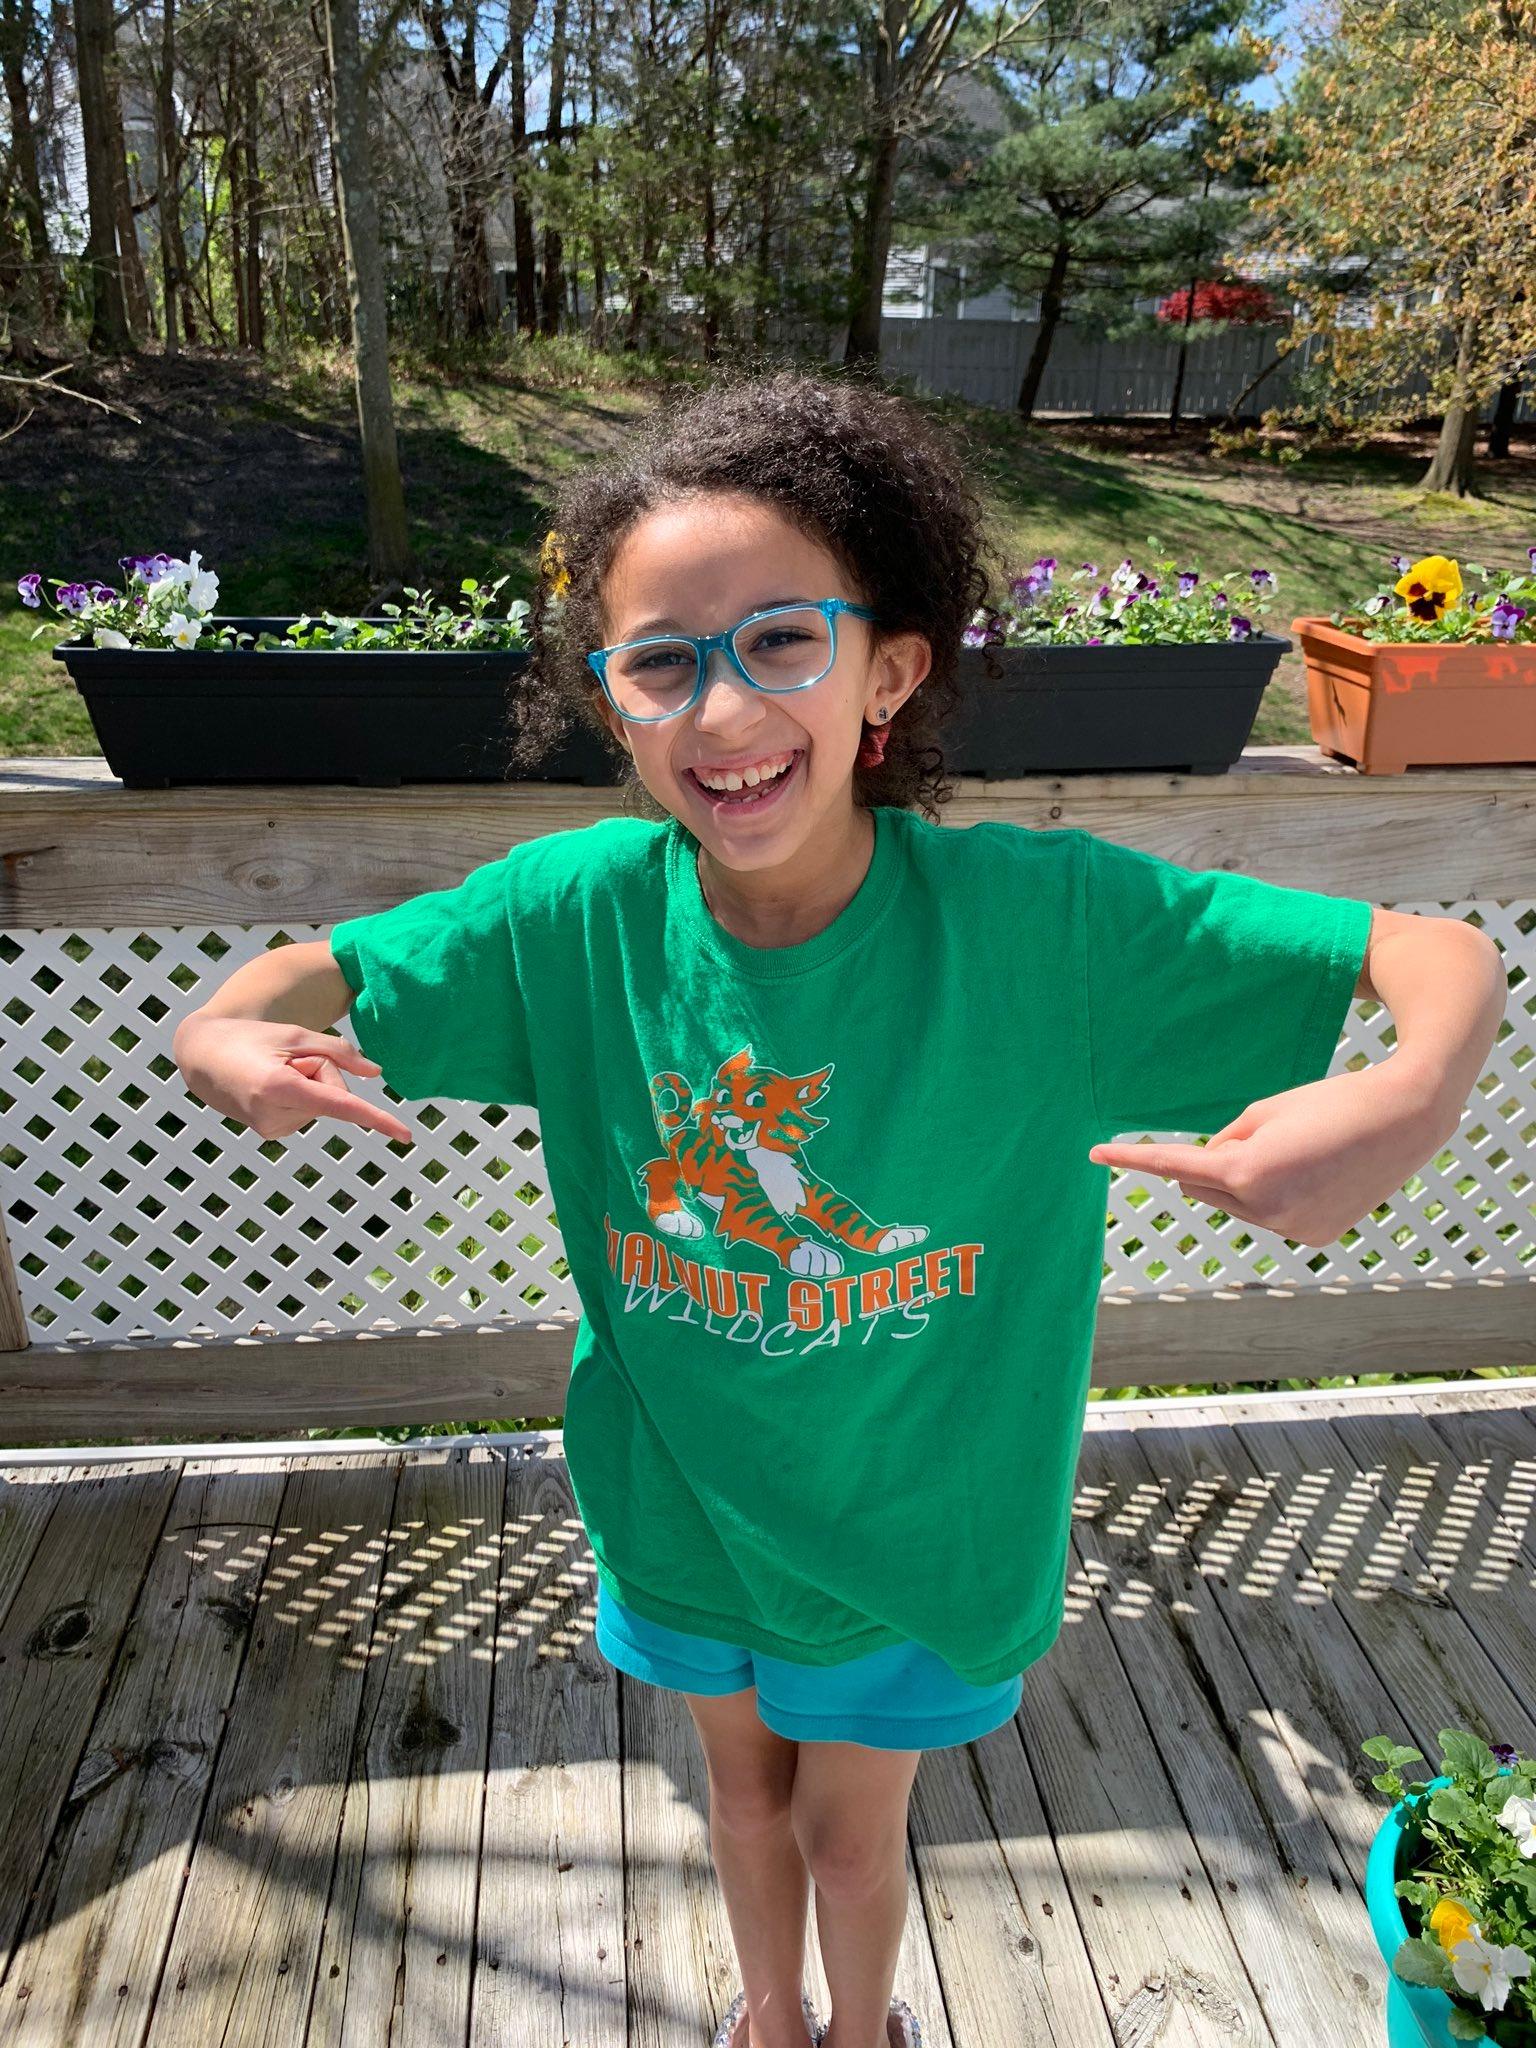 Kid in Green Shirt